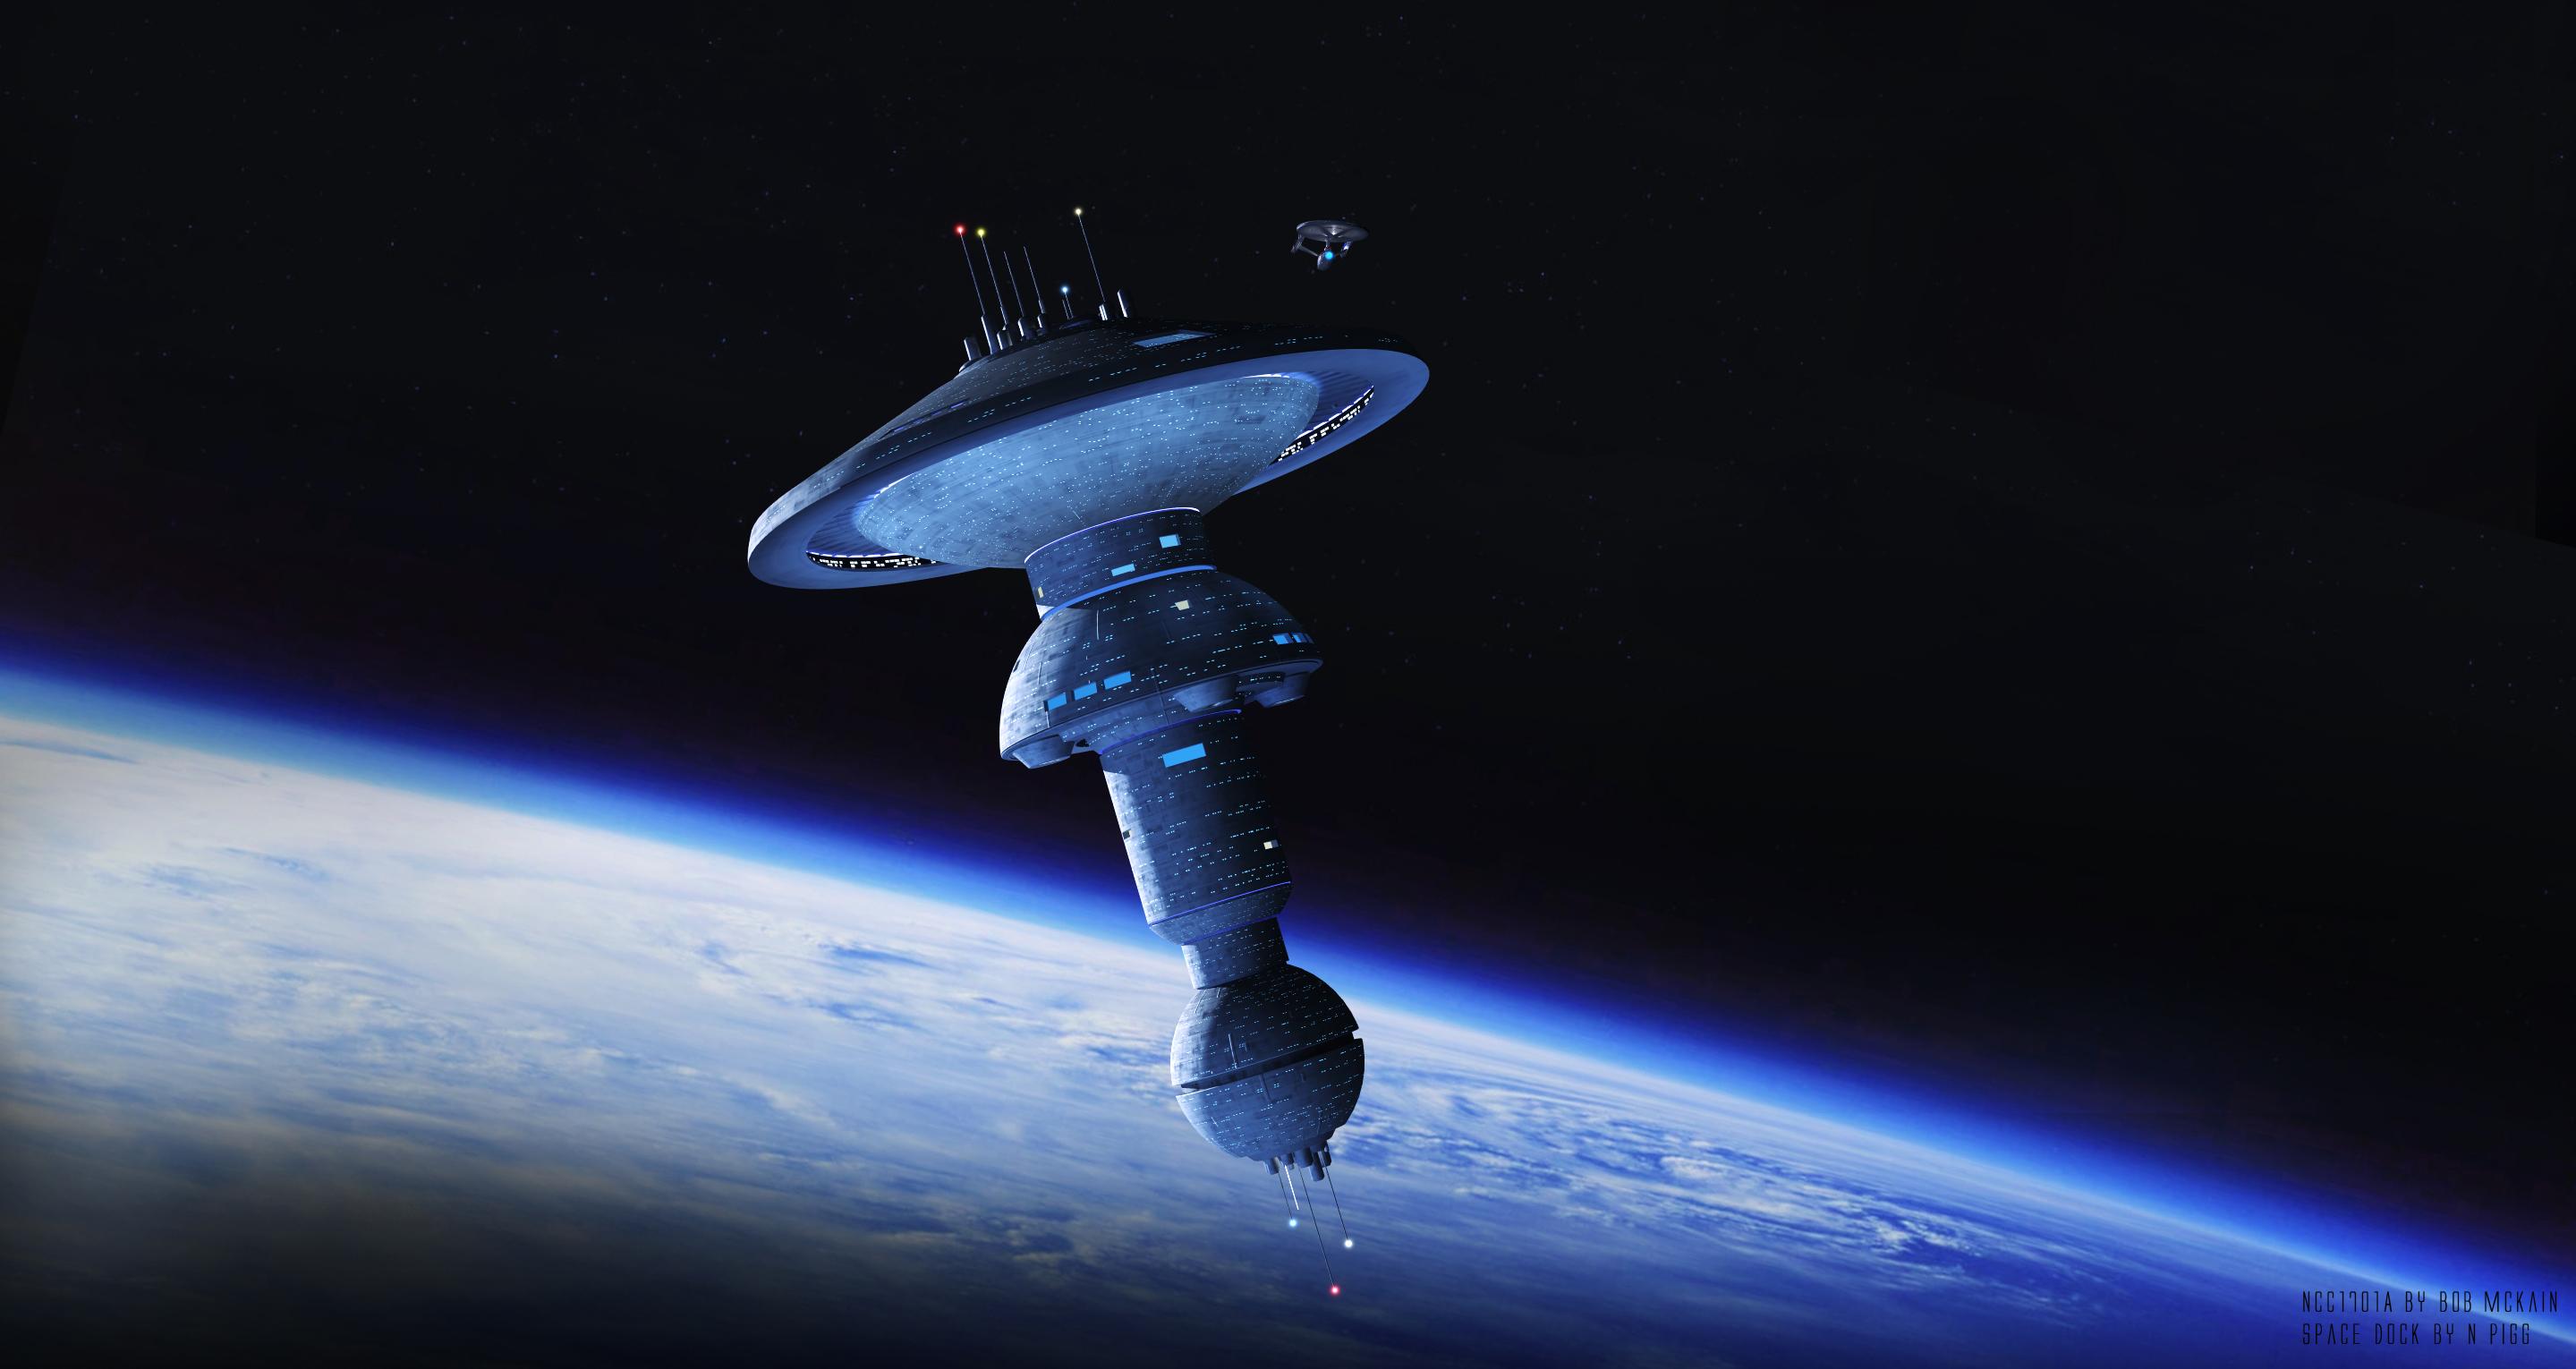 Wallpaper Digital Art Futuristic Space Star Trek Spacedock Starbase 2879x1530 Badr 1255199 Hd Wallpapers Wallhere